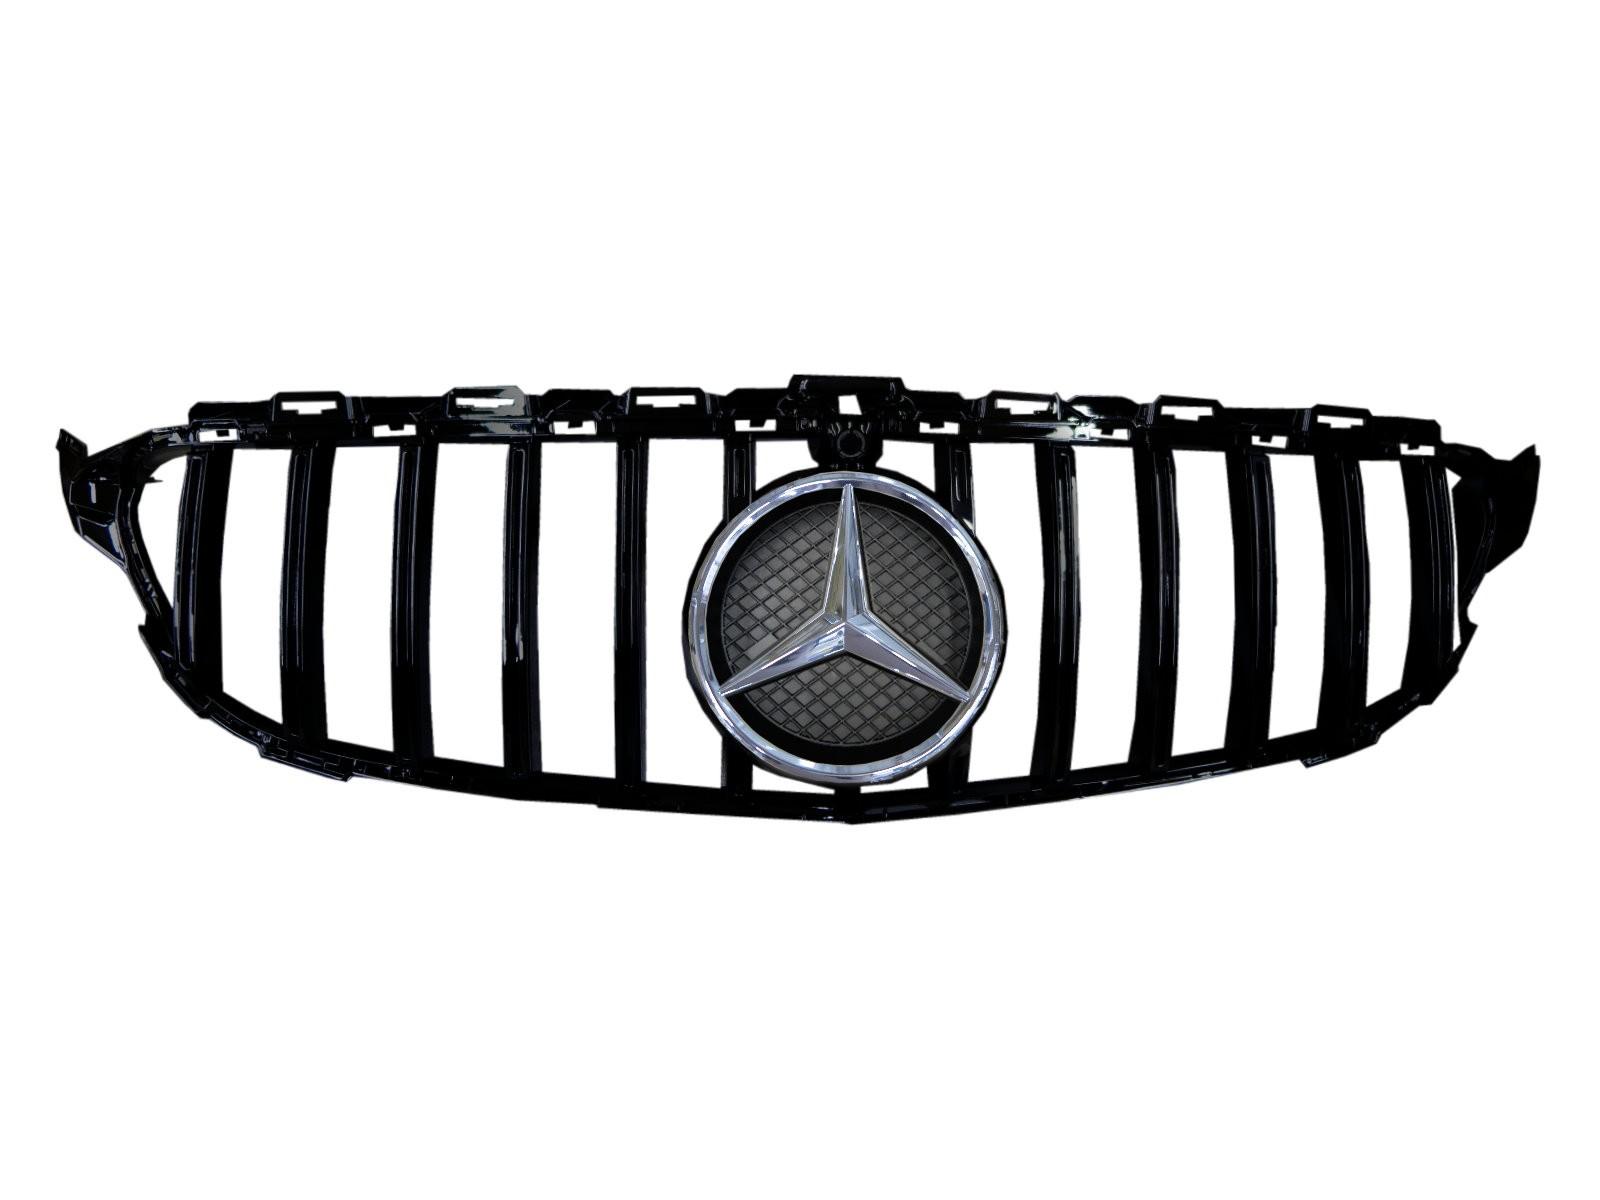 CrazyTheGod C-CLASS W205 2014-2018 Pre-Facelift Sedan 4D Star Emblem GRILLE/GRILL Gloss Black for Mercedes-Benz